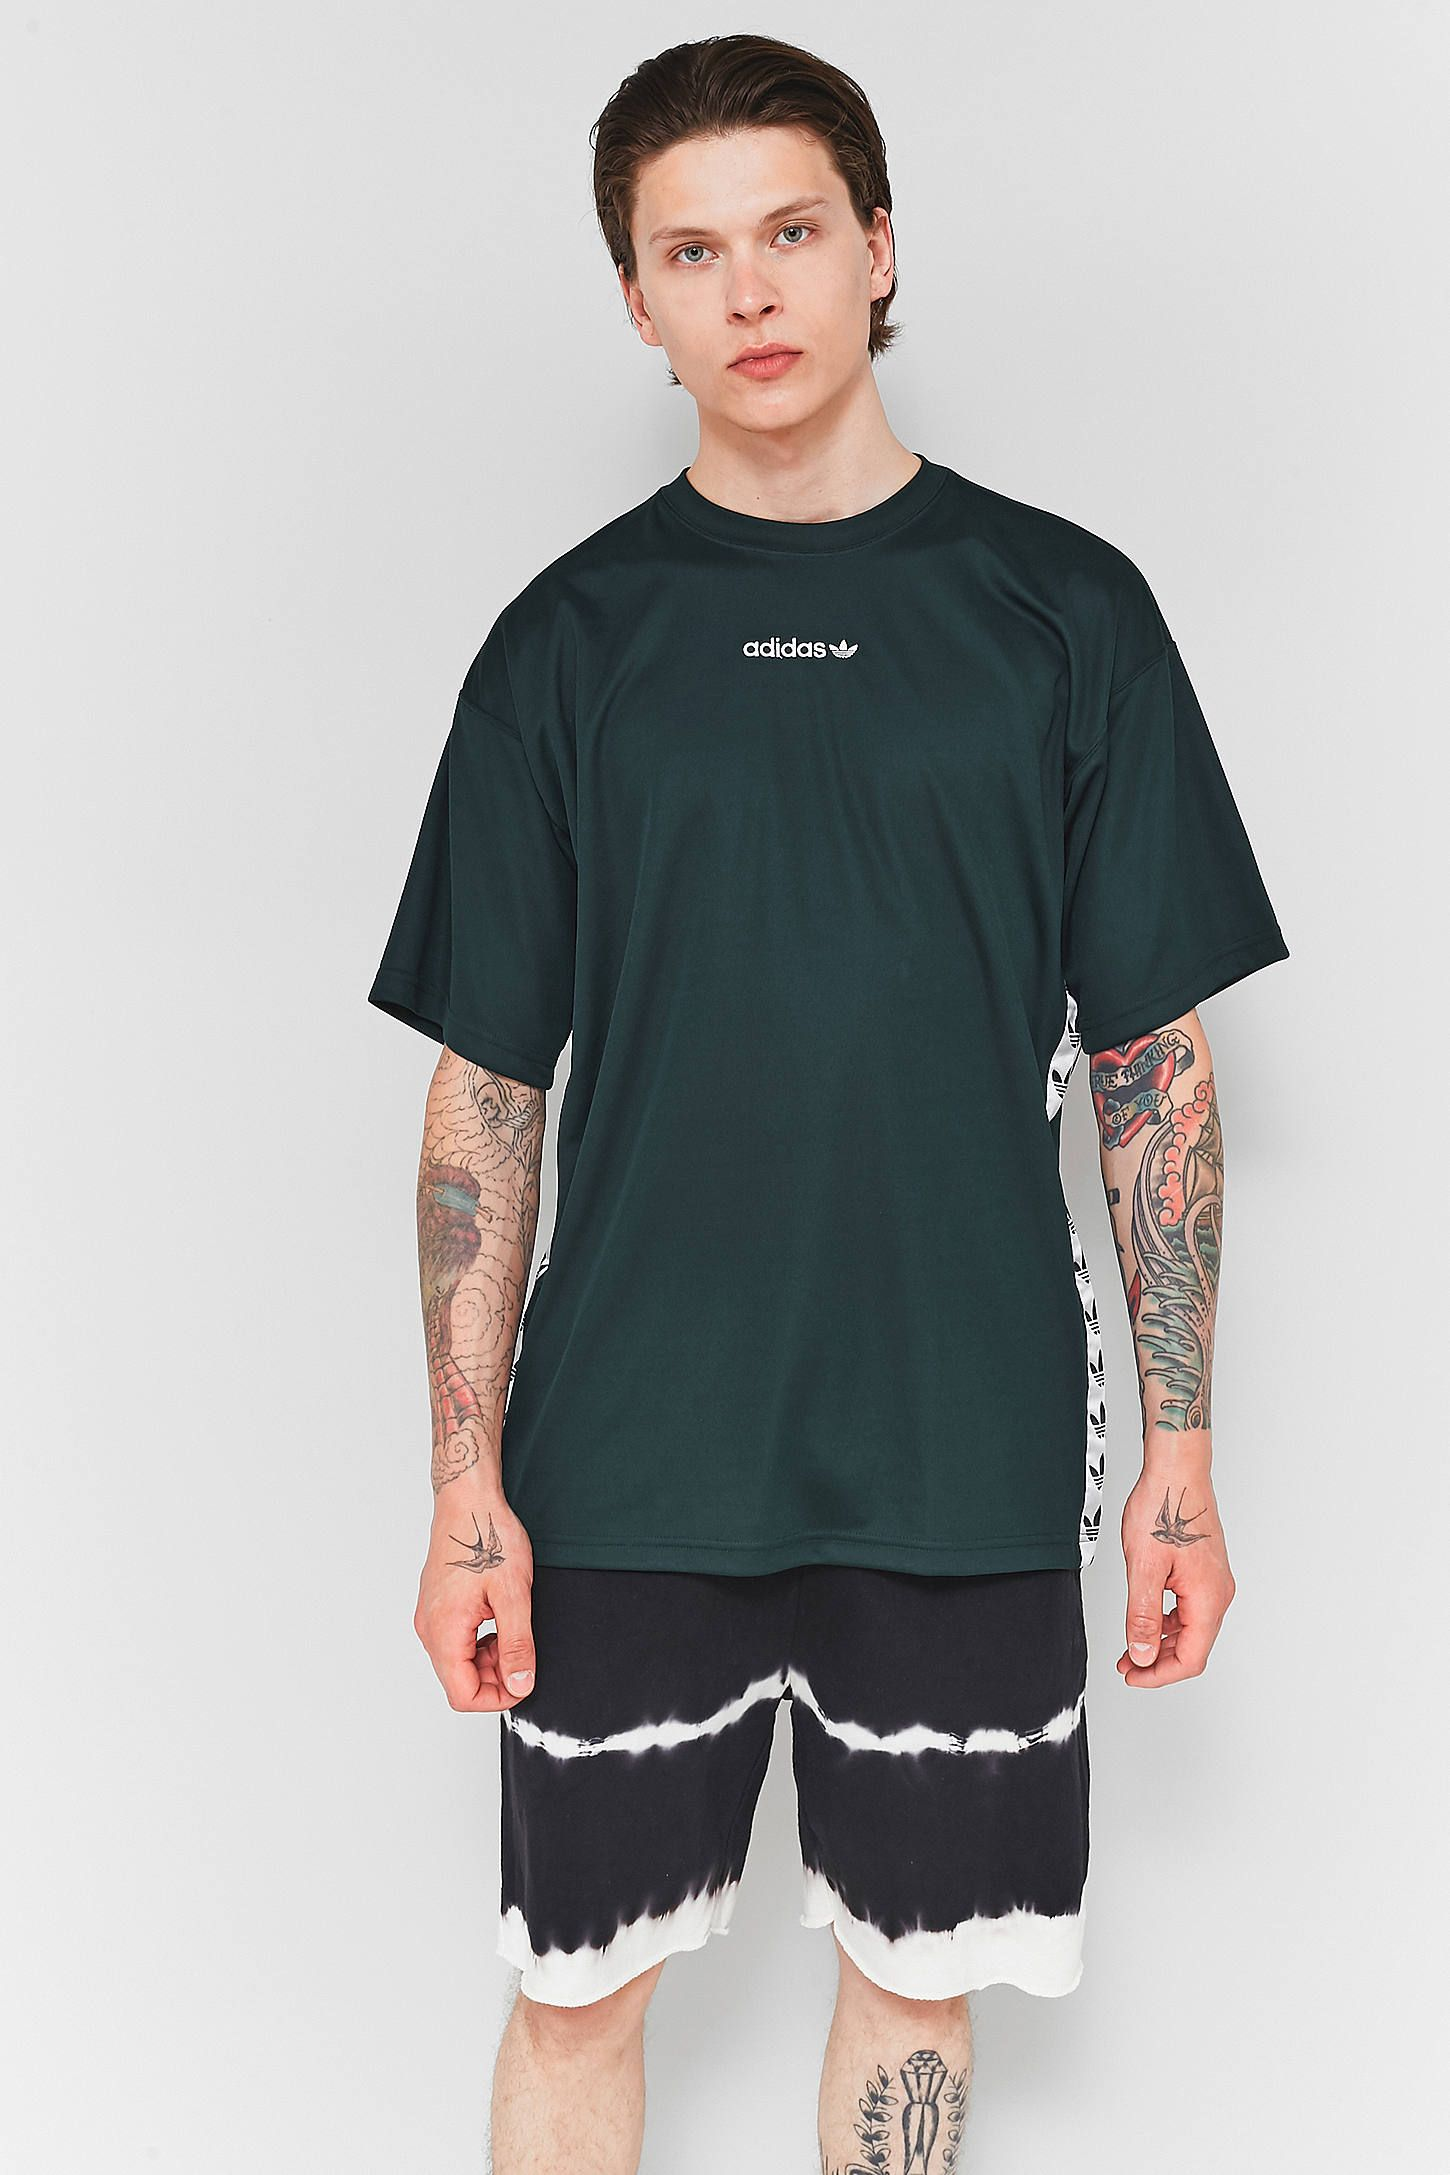 camiseta adidas TNT Green TNT Night camiseta Taped Green | e29184d - rspr.host